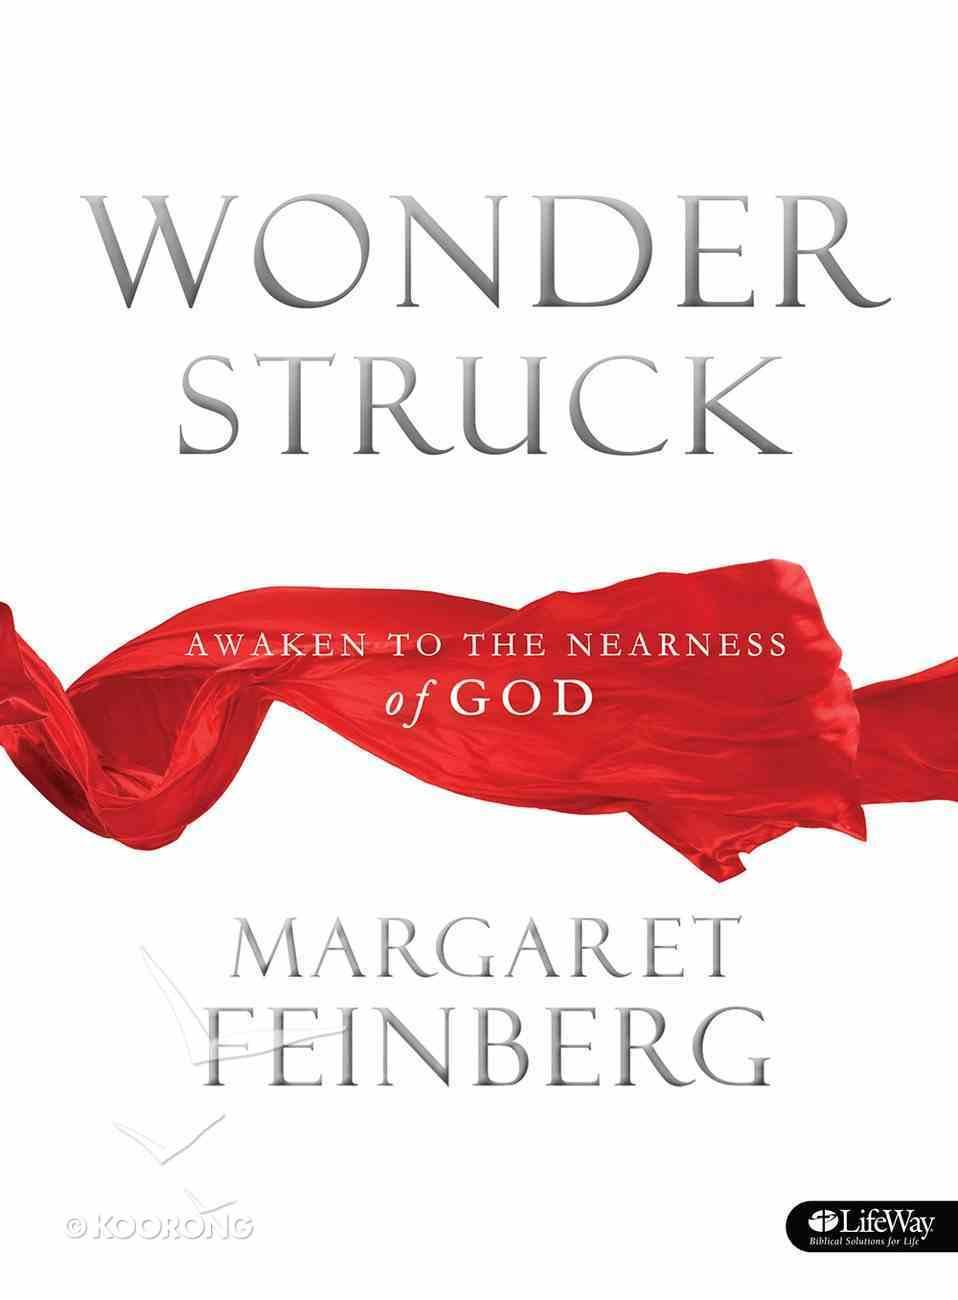 Wonderstruck: Awaken to the Nearness of God (Member Book) Paperback